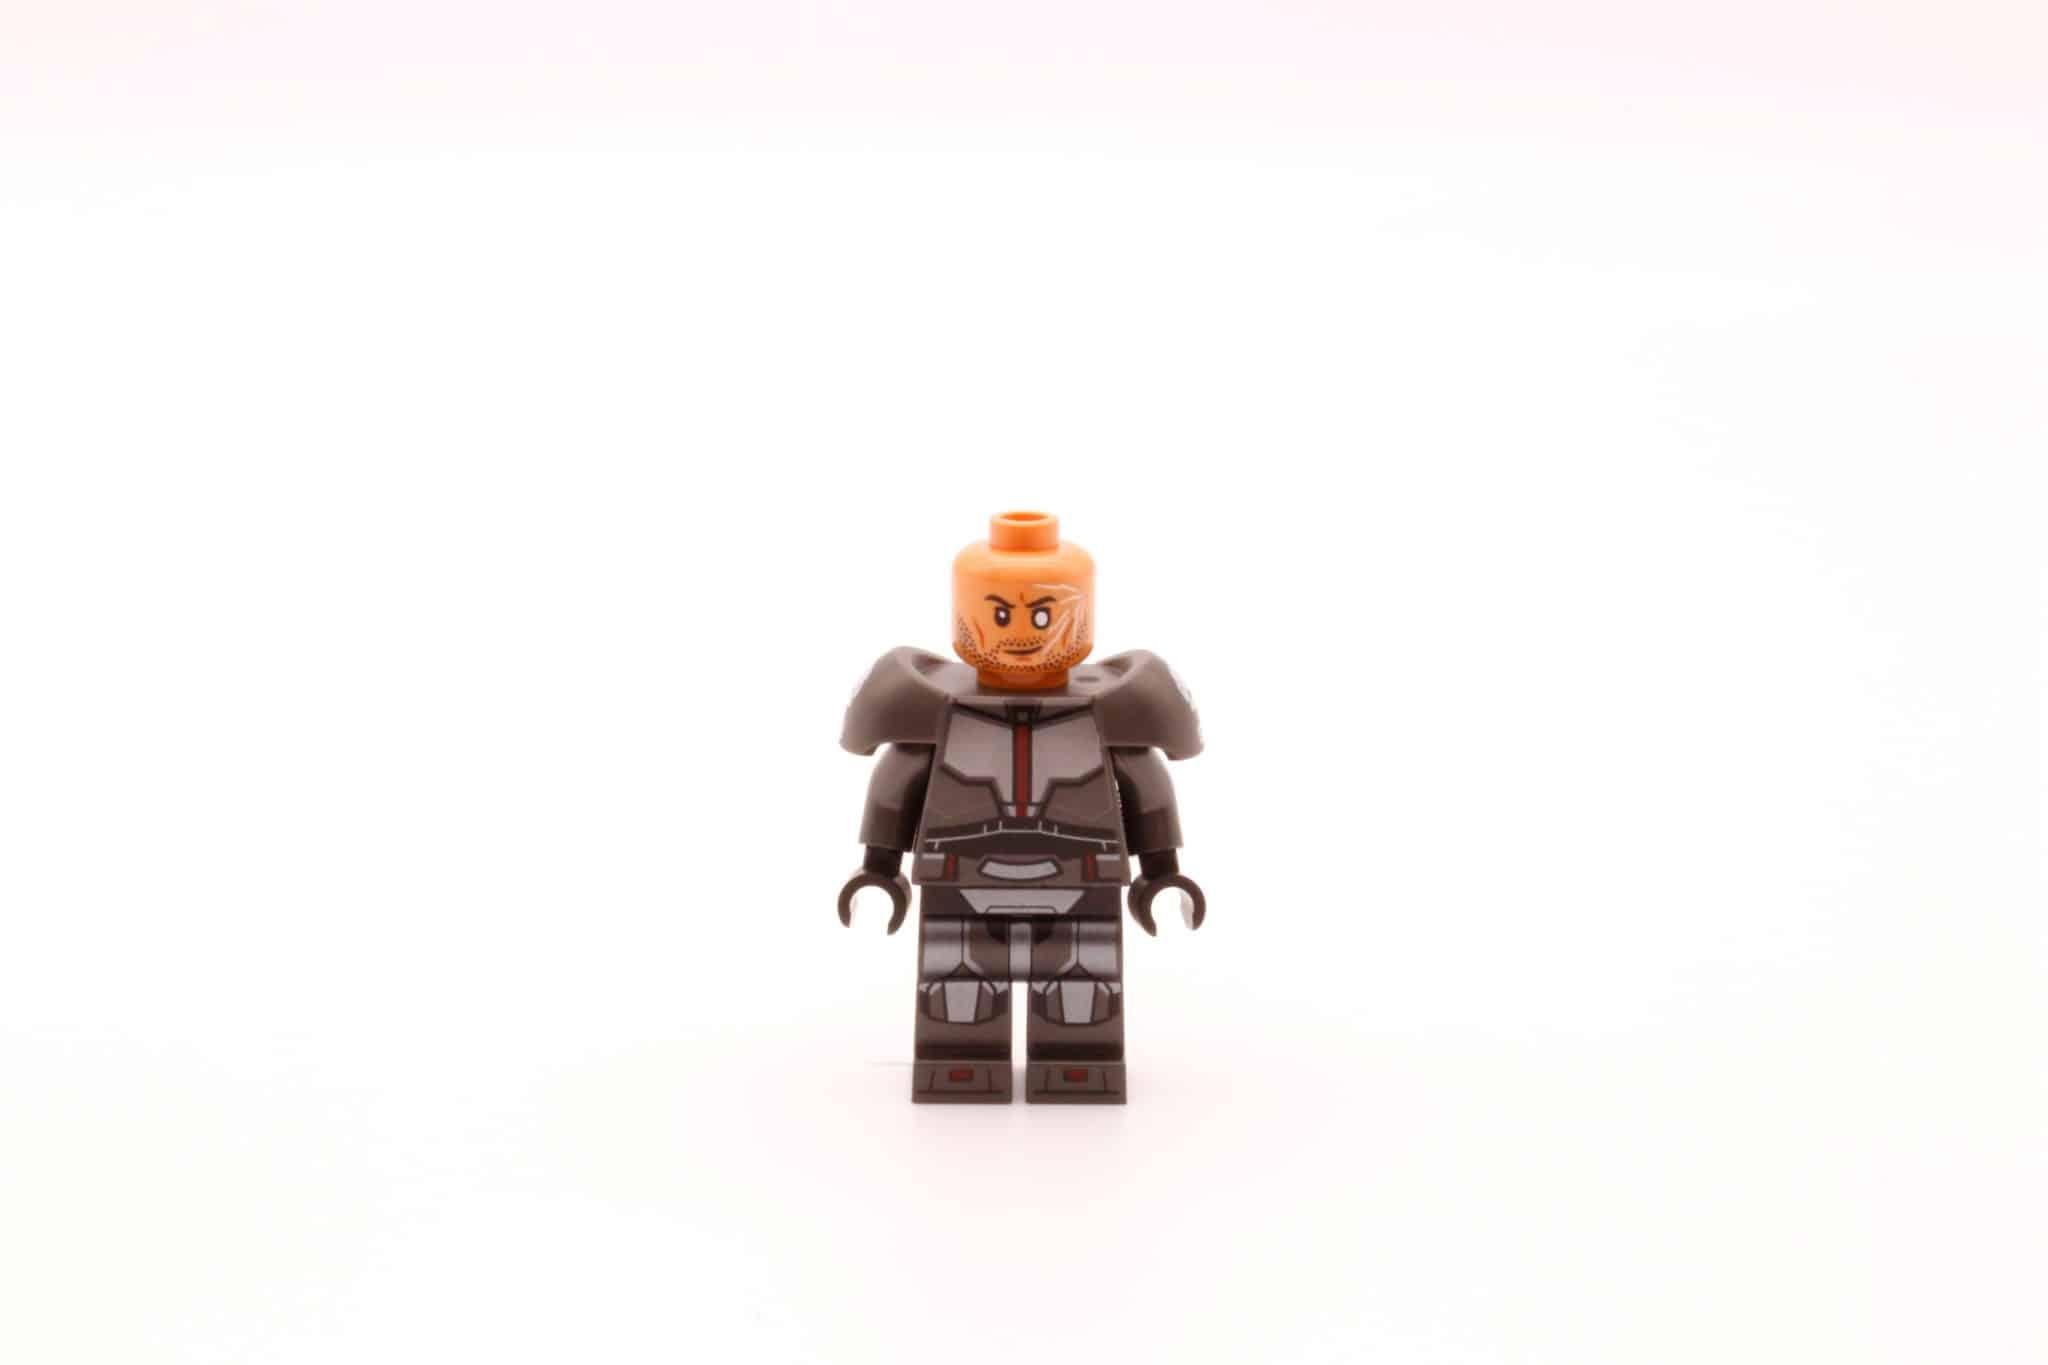 LEGO Star Wars 75314 The Bad Batch Attack Shuttle Wrecker ohne Helm